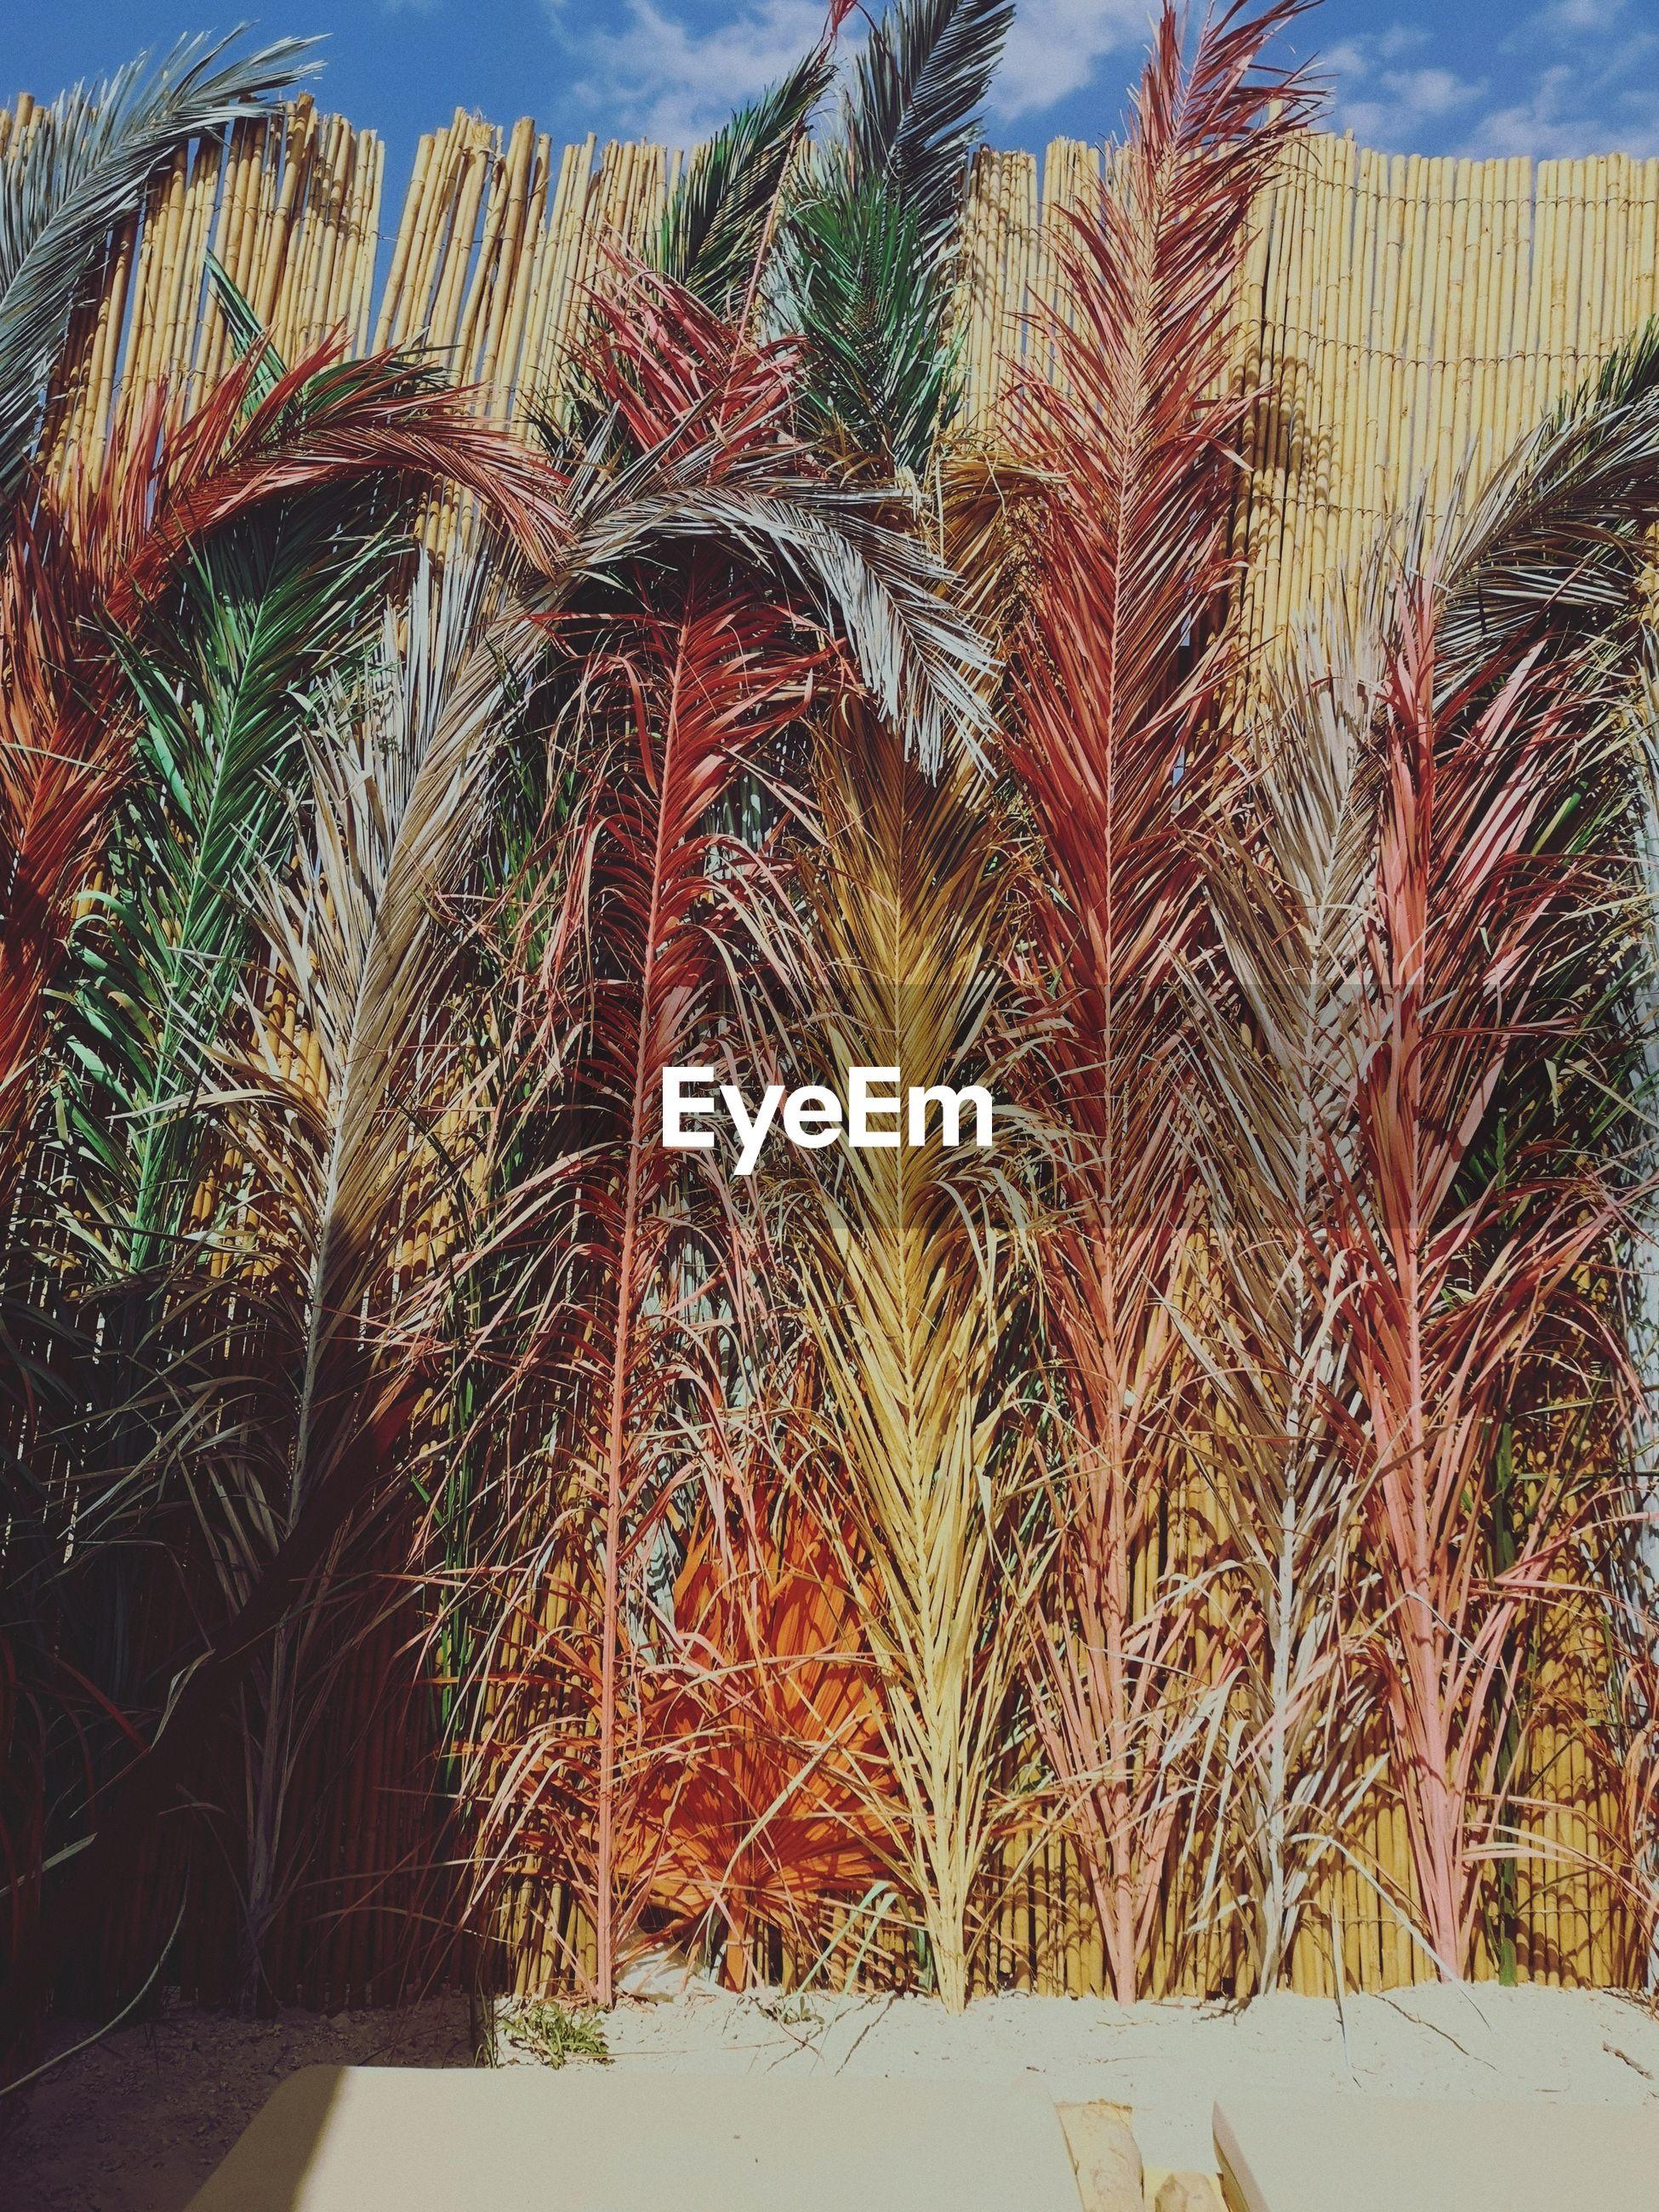 FULL FRAME SHOT OF PALM TREE IN FIELD